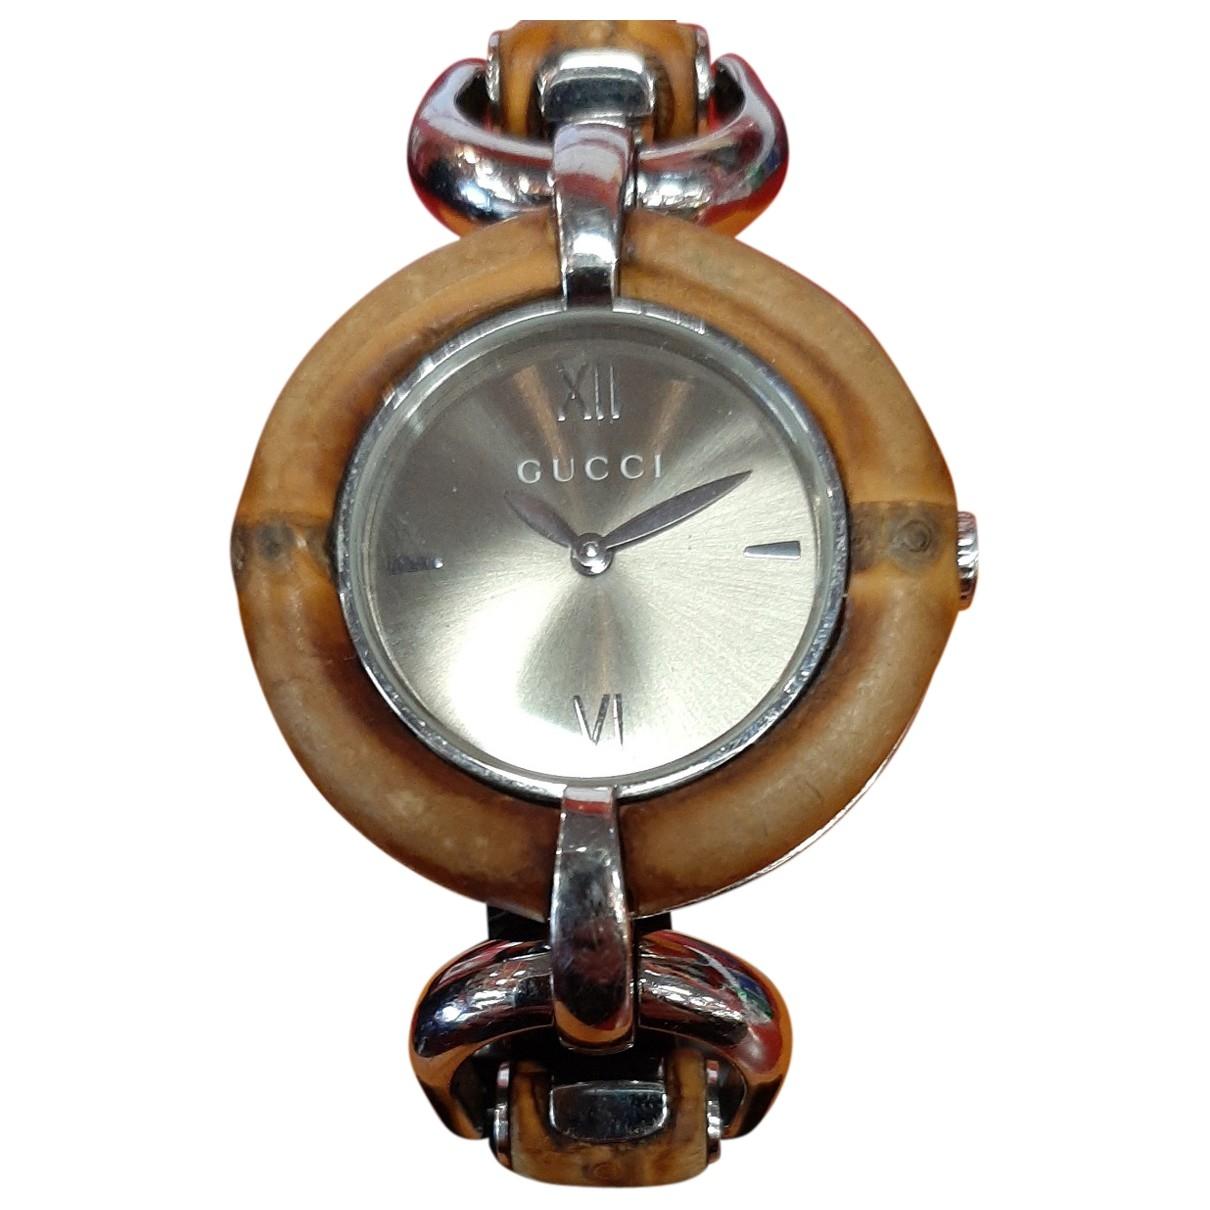 Gucci Bamboo Uhr in  Braun Stahl